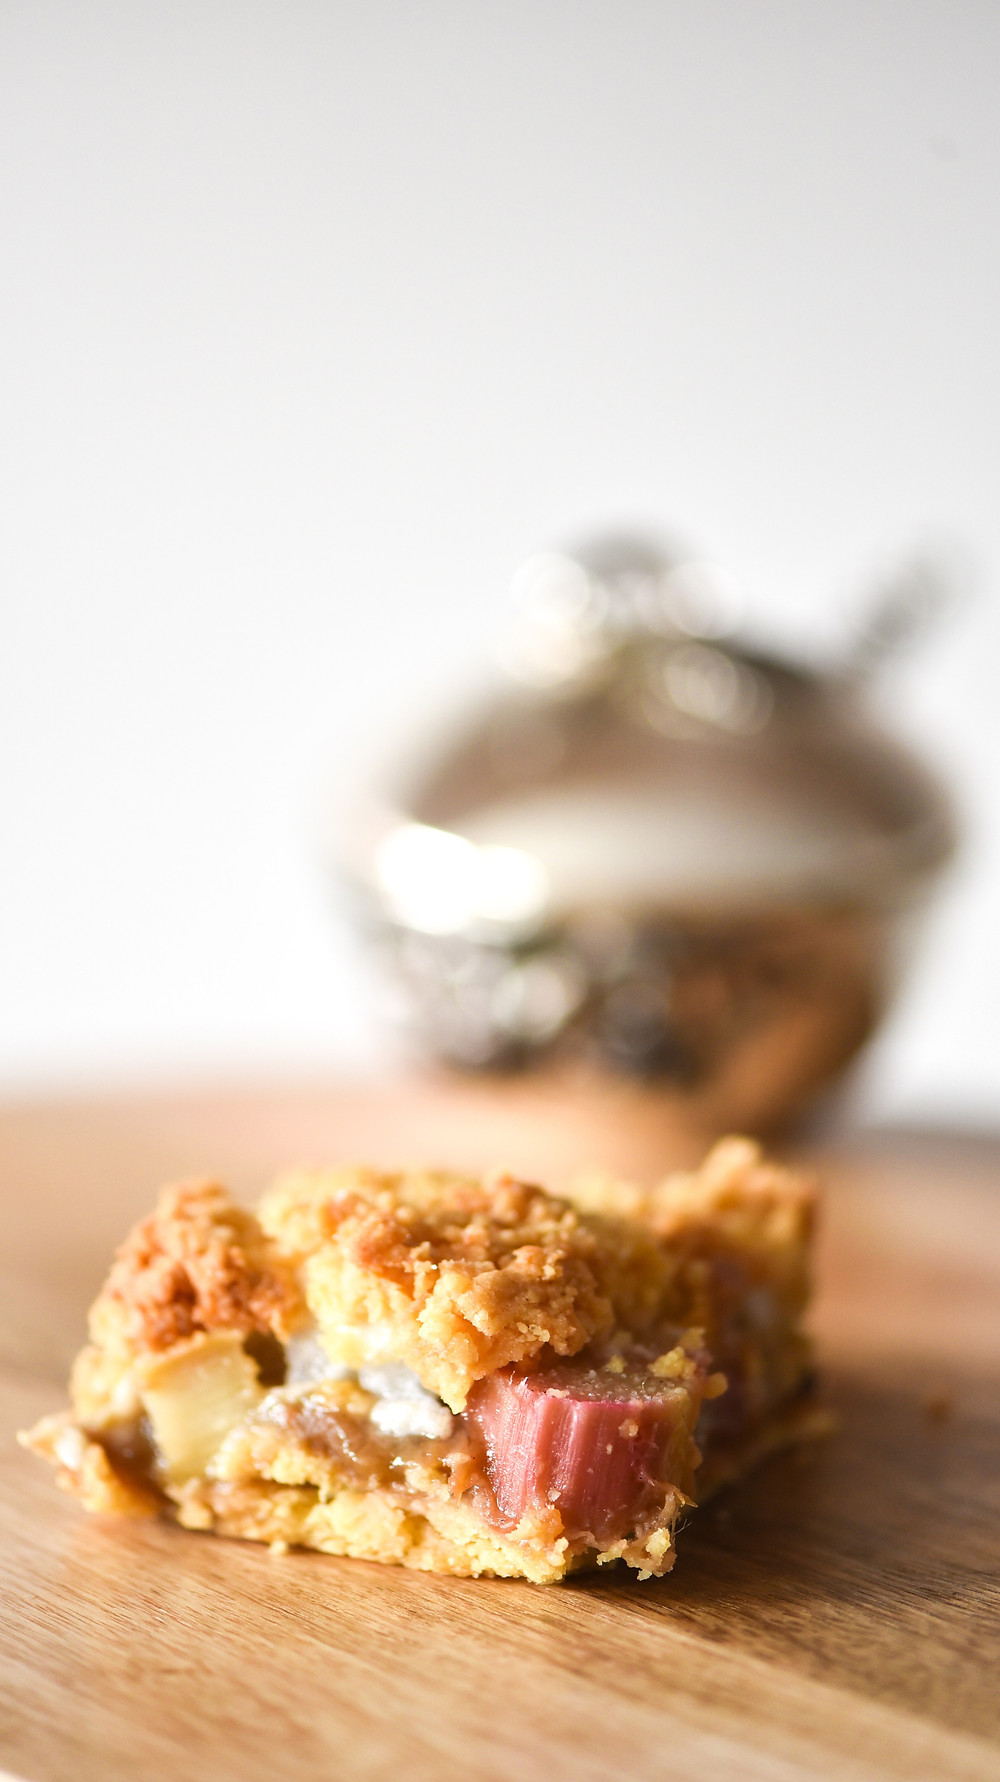 Rhubarb Shortbread Cake